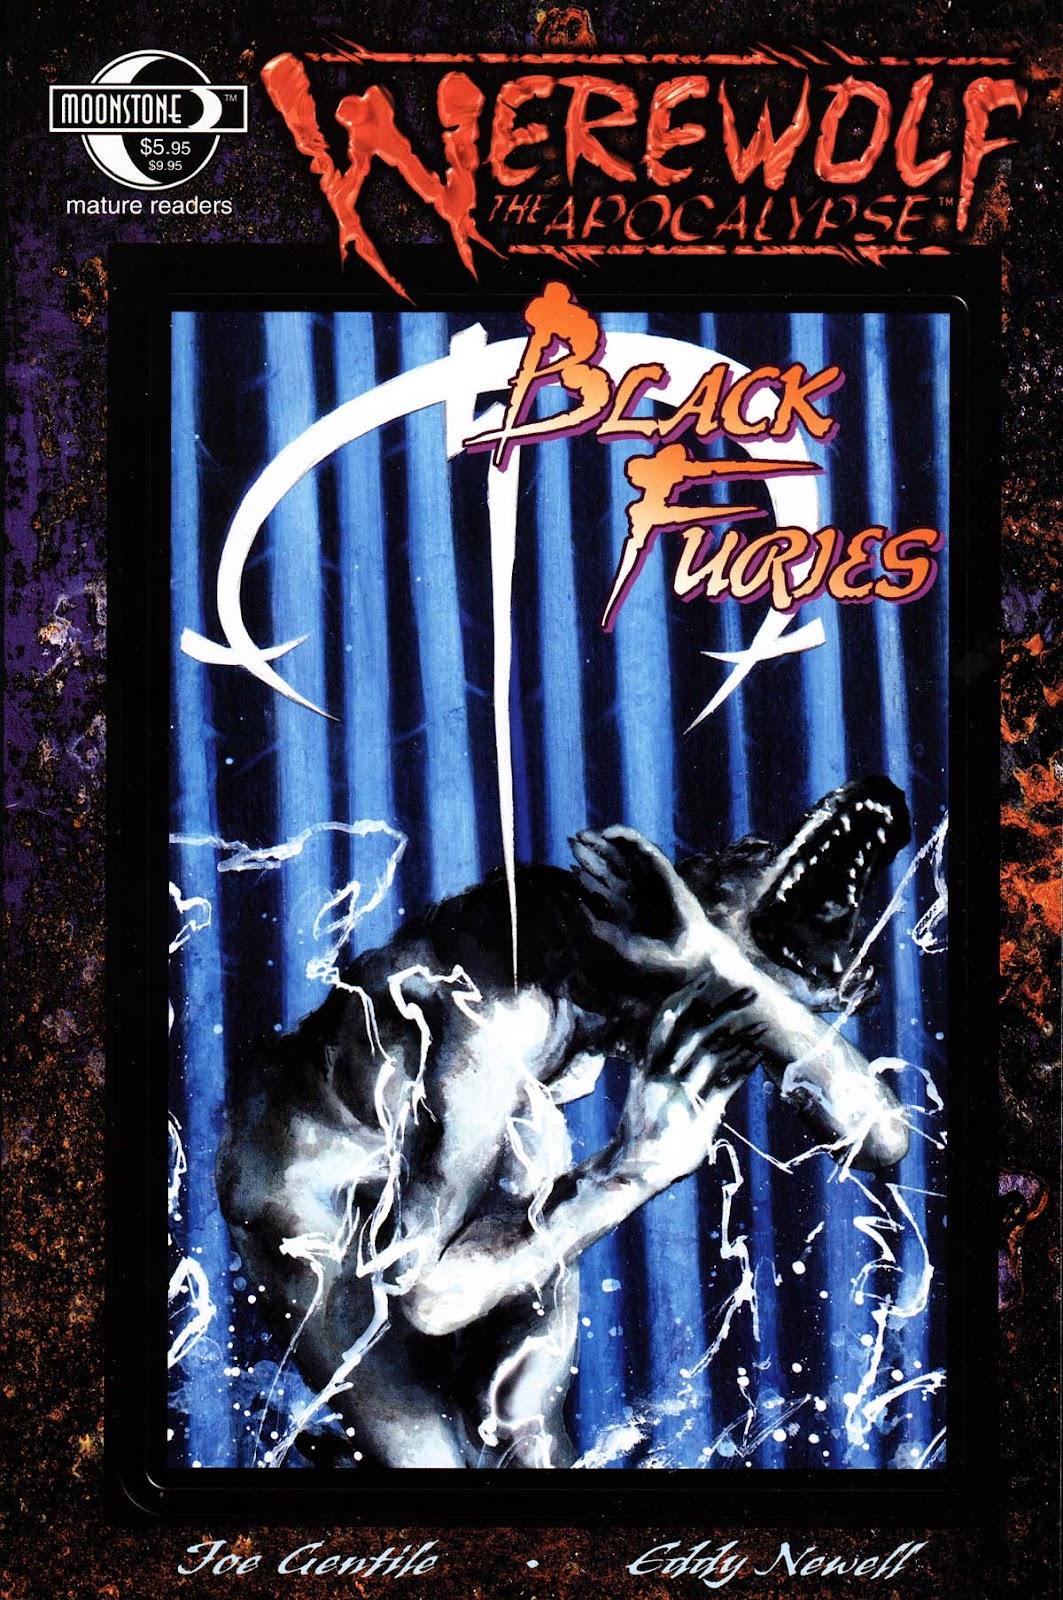 Read online Werewolf the Apocalypse comic -  Issue # Black Furies - 1